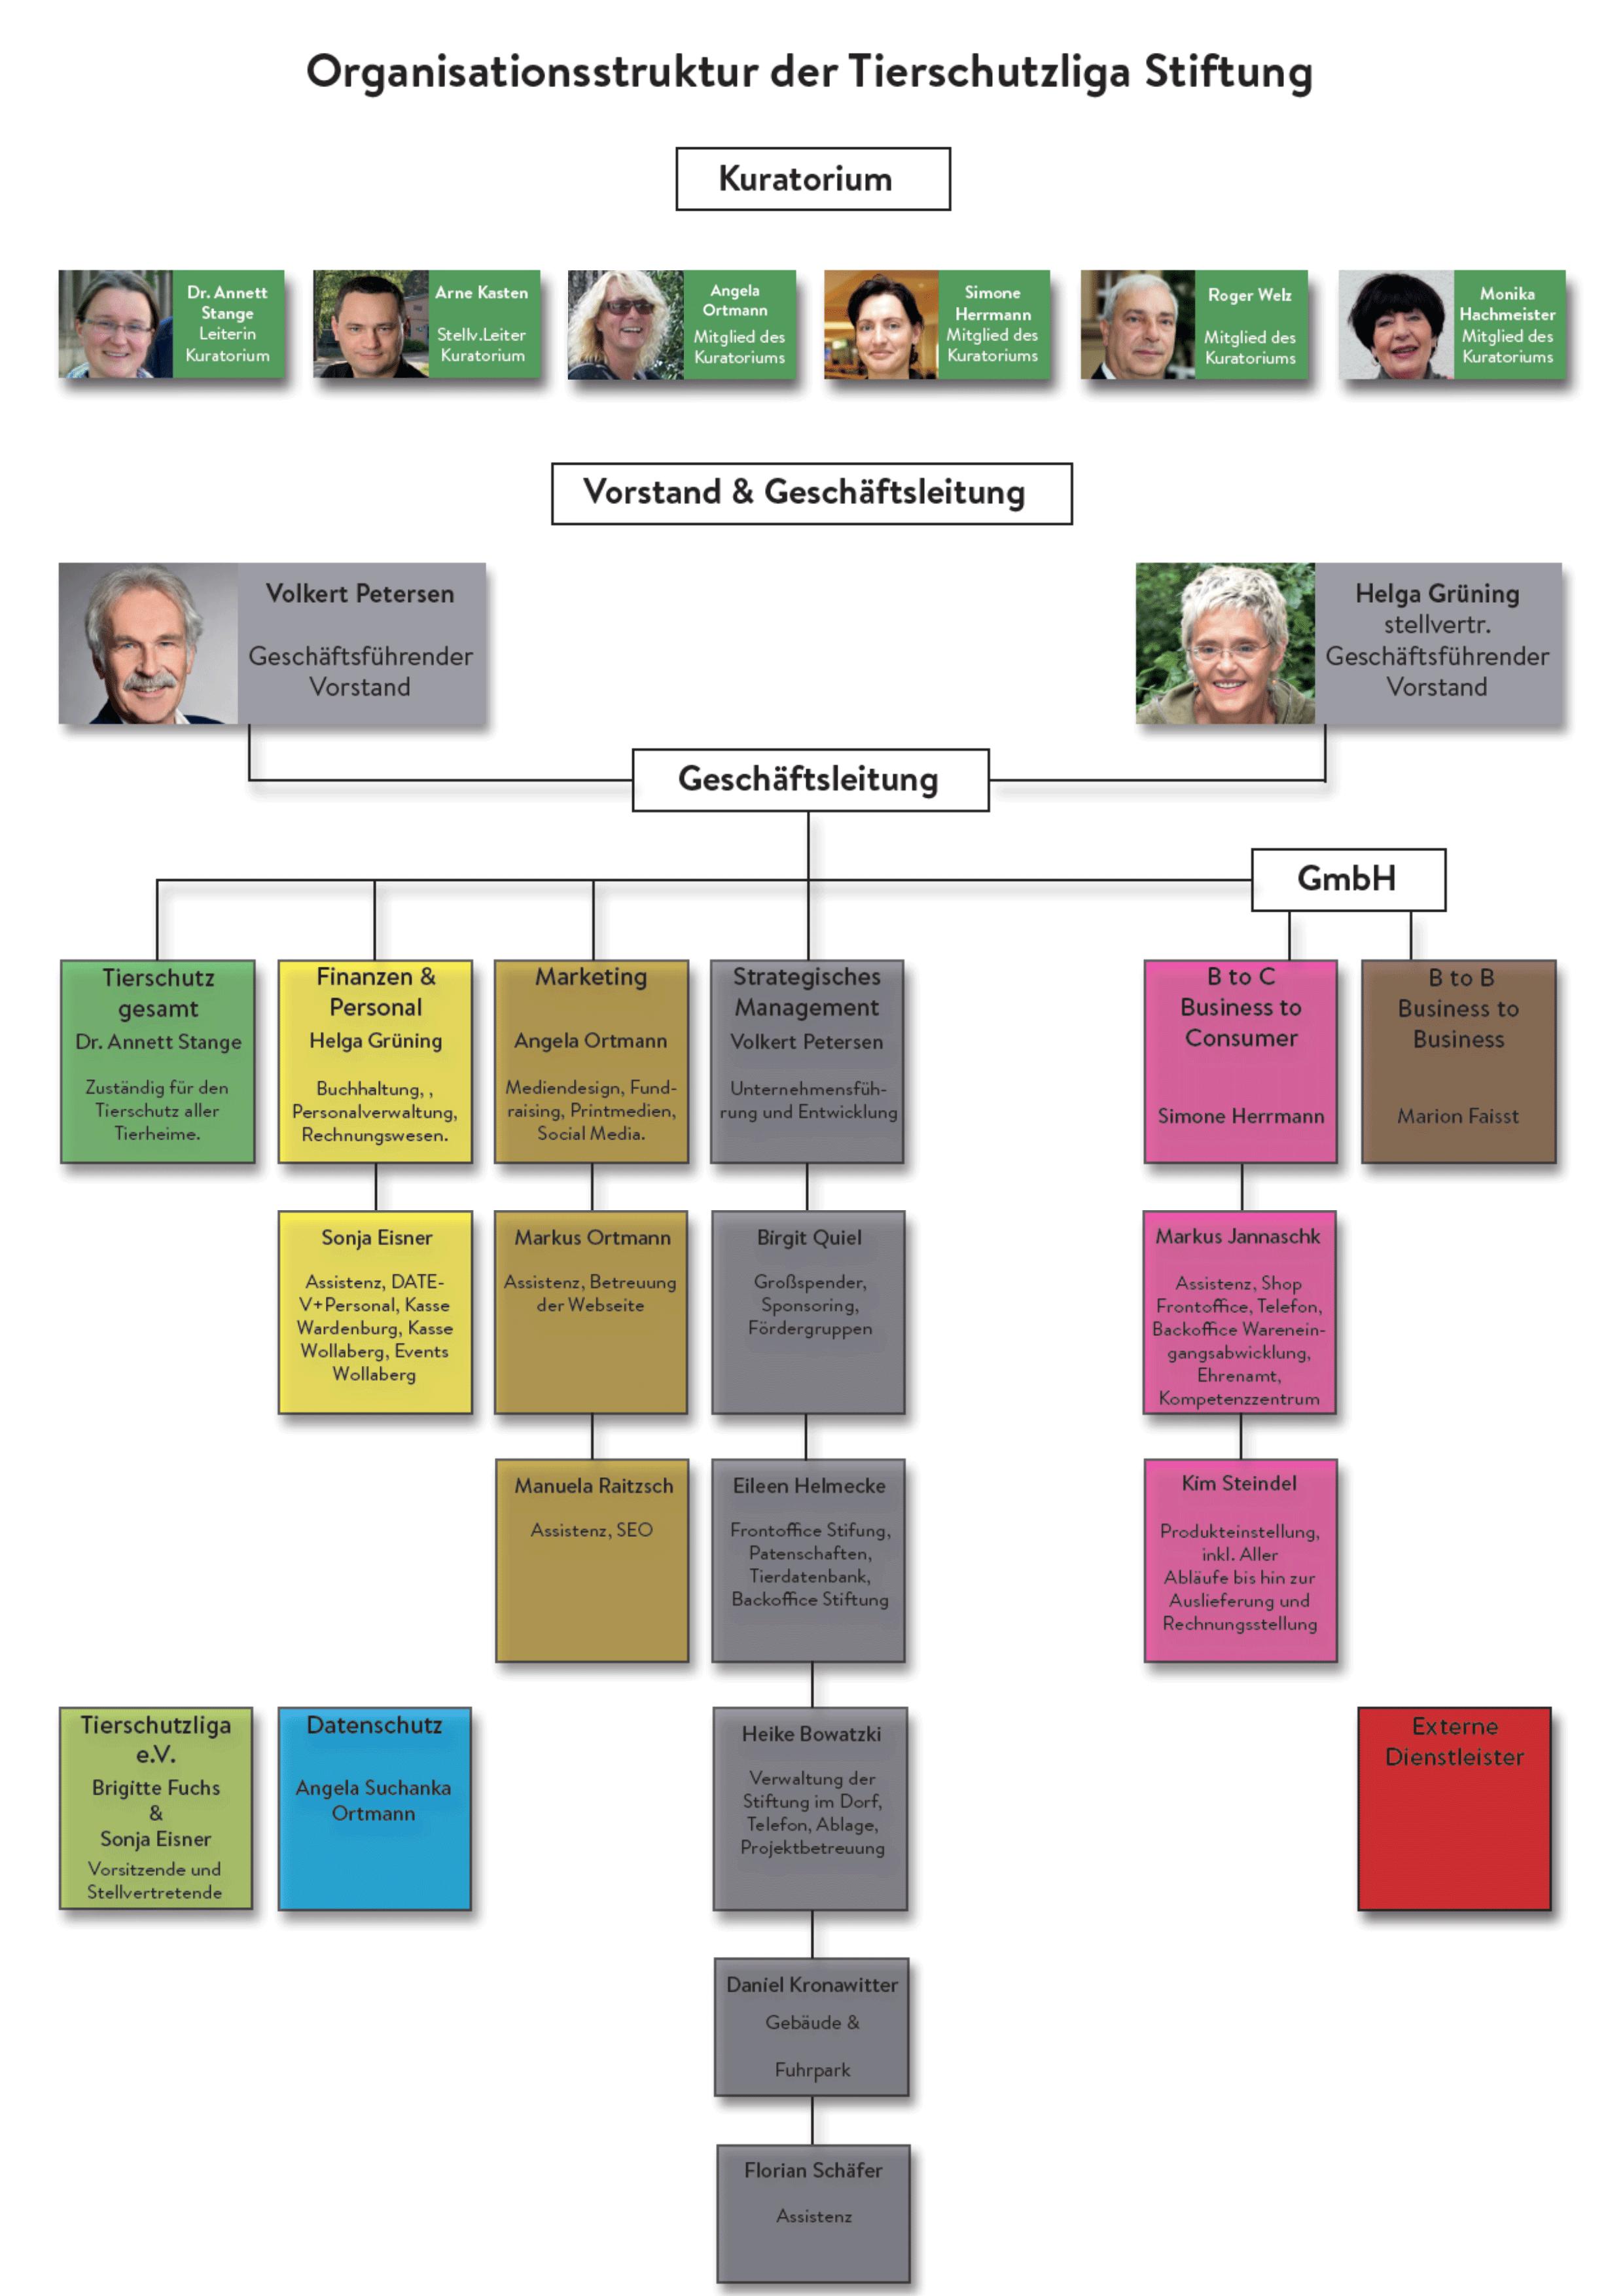 organigramm-tierschutzliga-stiftung-neu1 Organisationsstruktur Stiftung Tierschutzliga